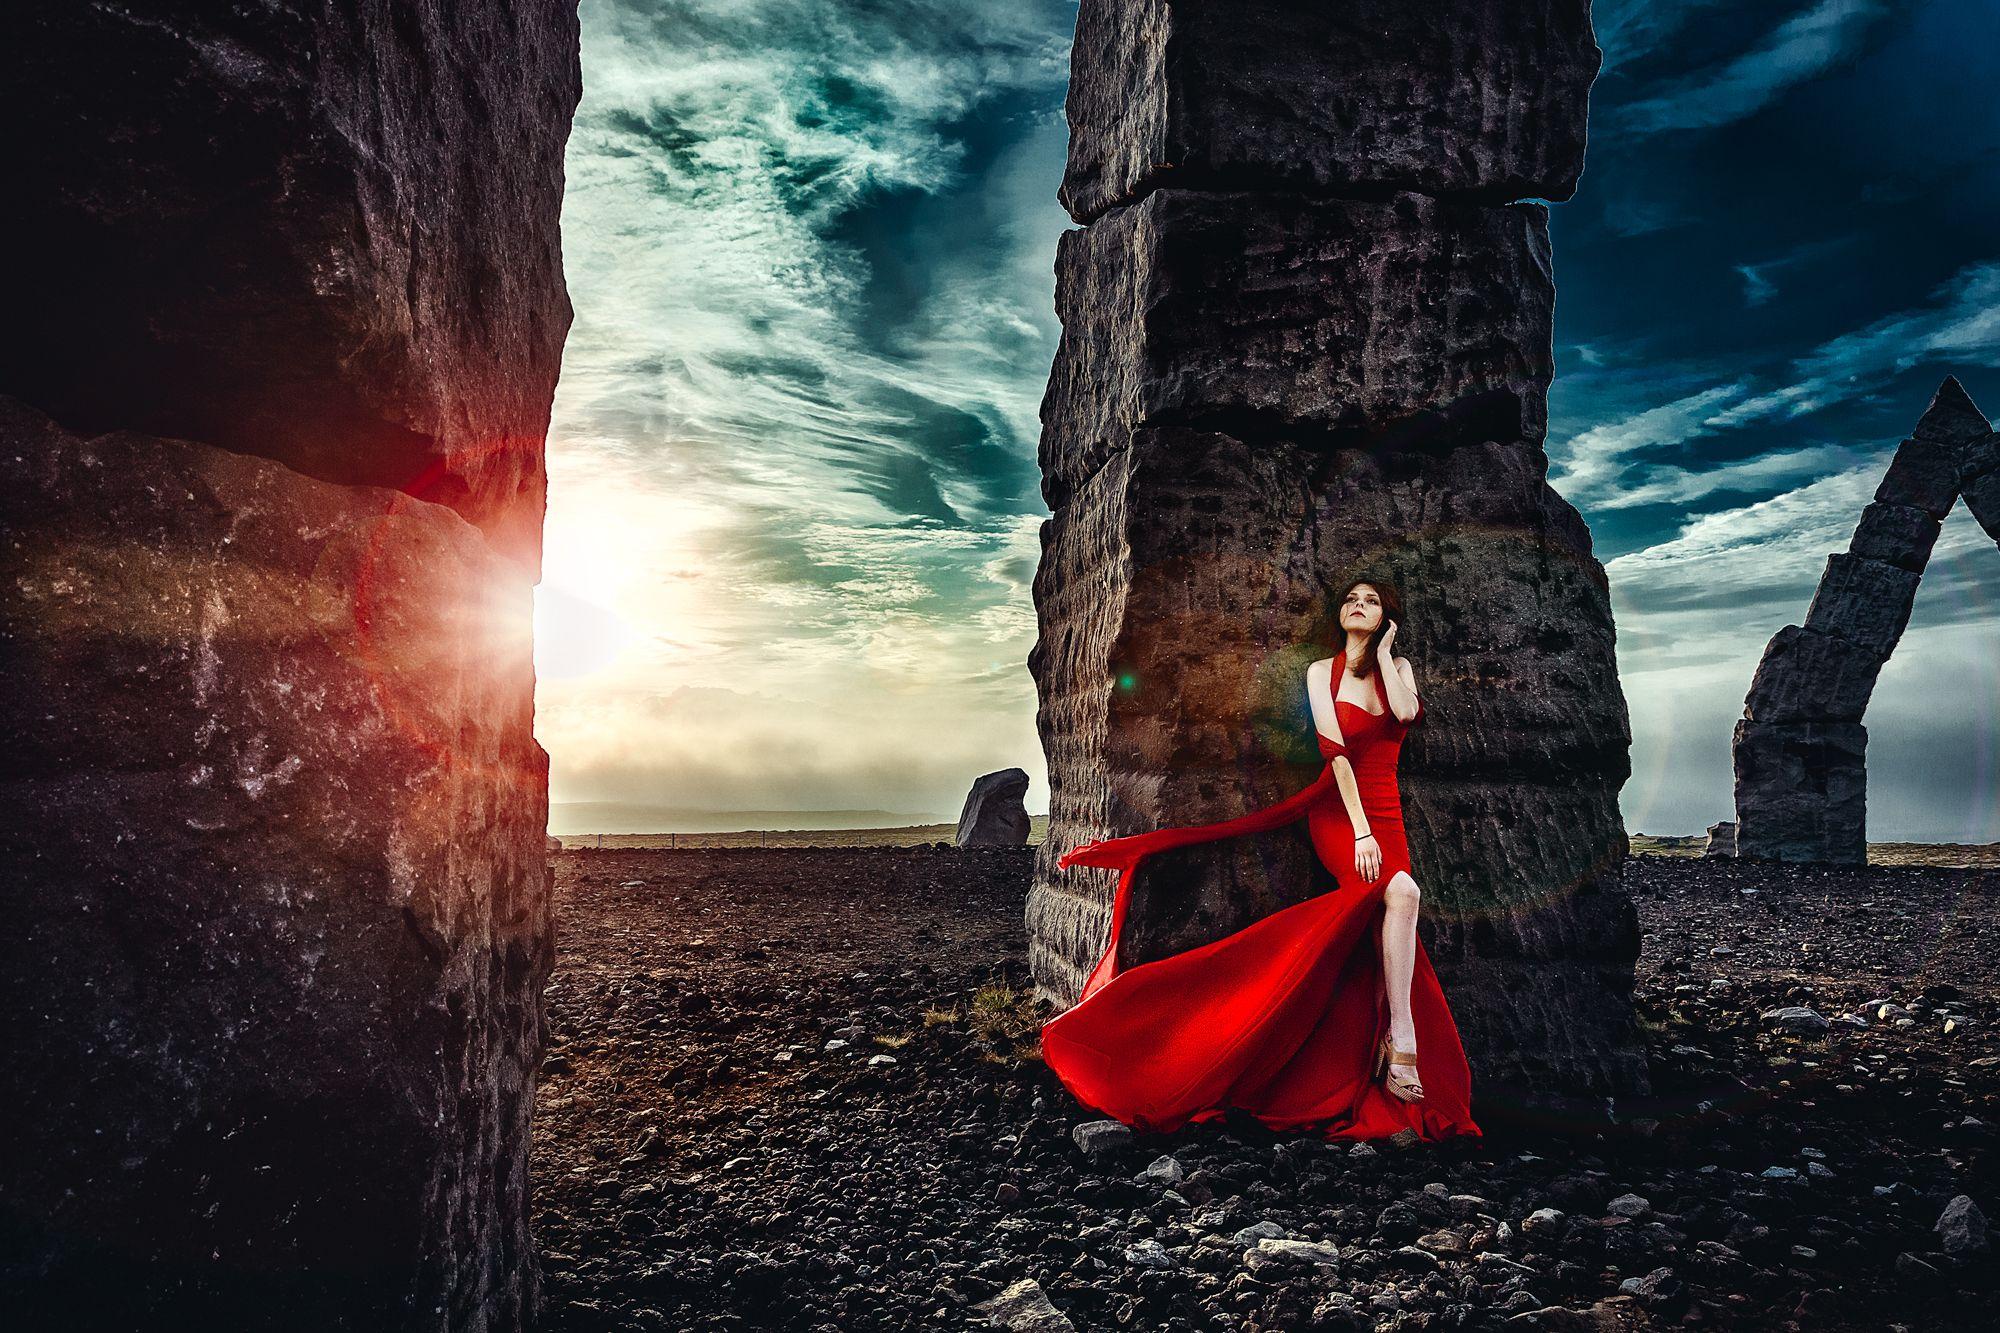 woman, portrait, fashion, beauty, outdoors, travel, Руслан Болгов (Axe)